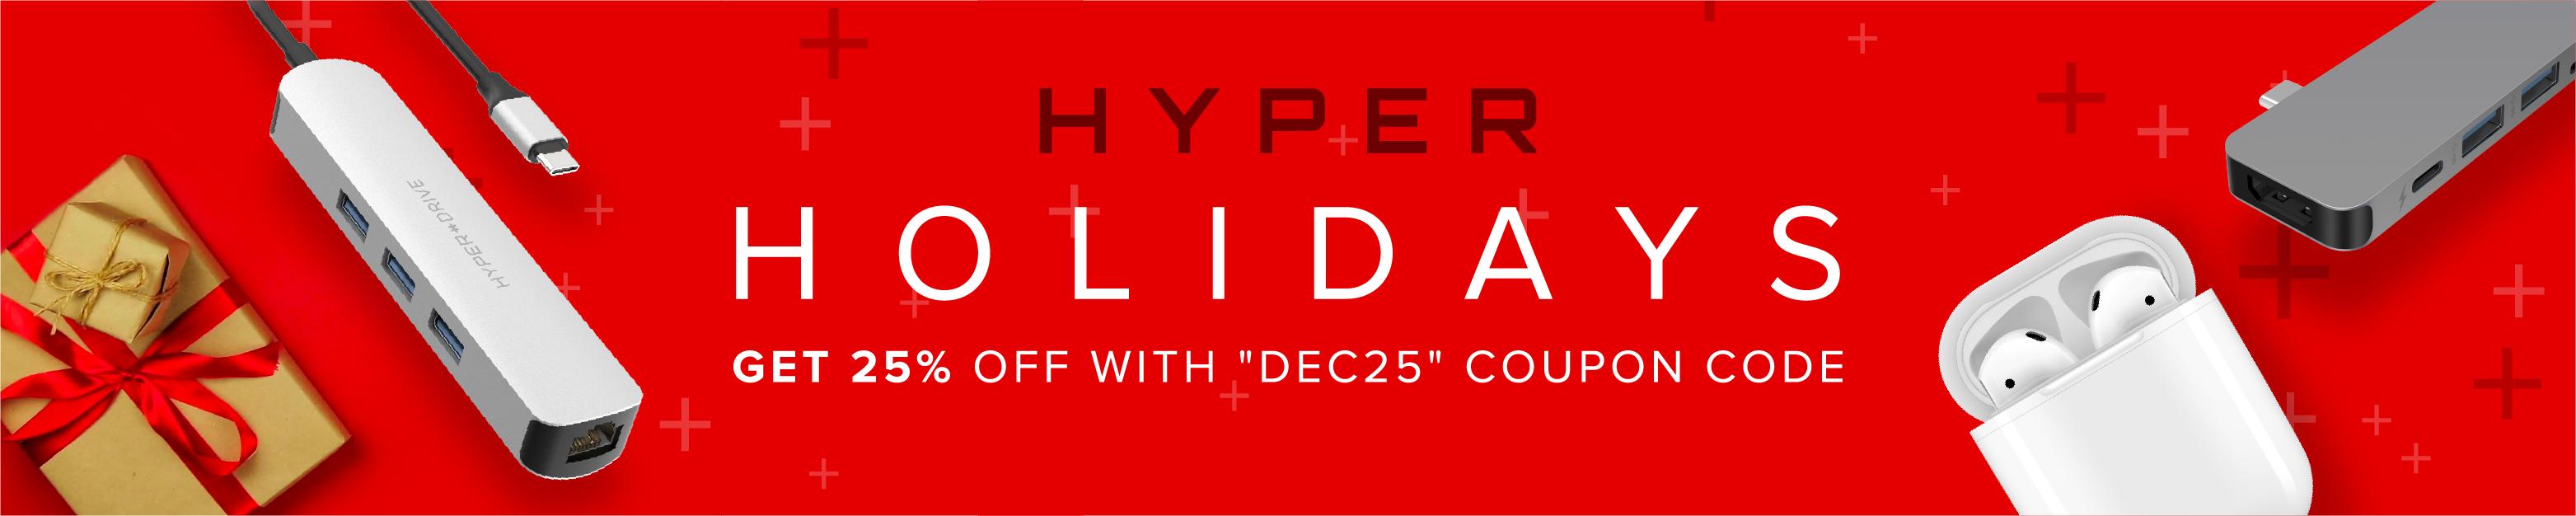 Hyper USB-C Hub sale